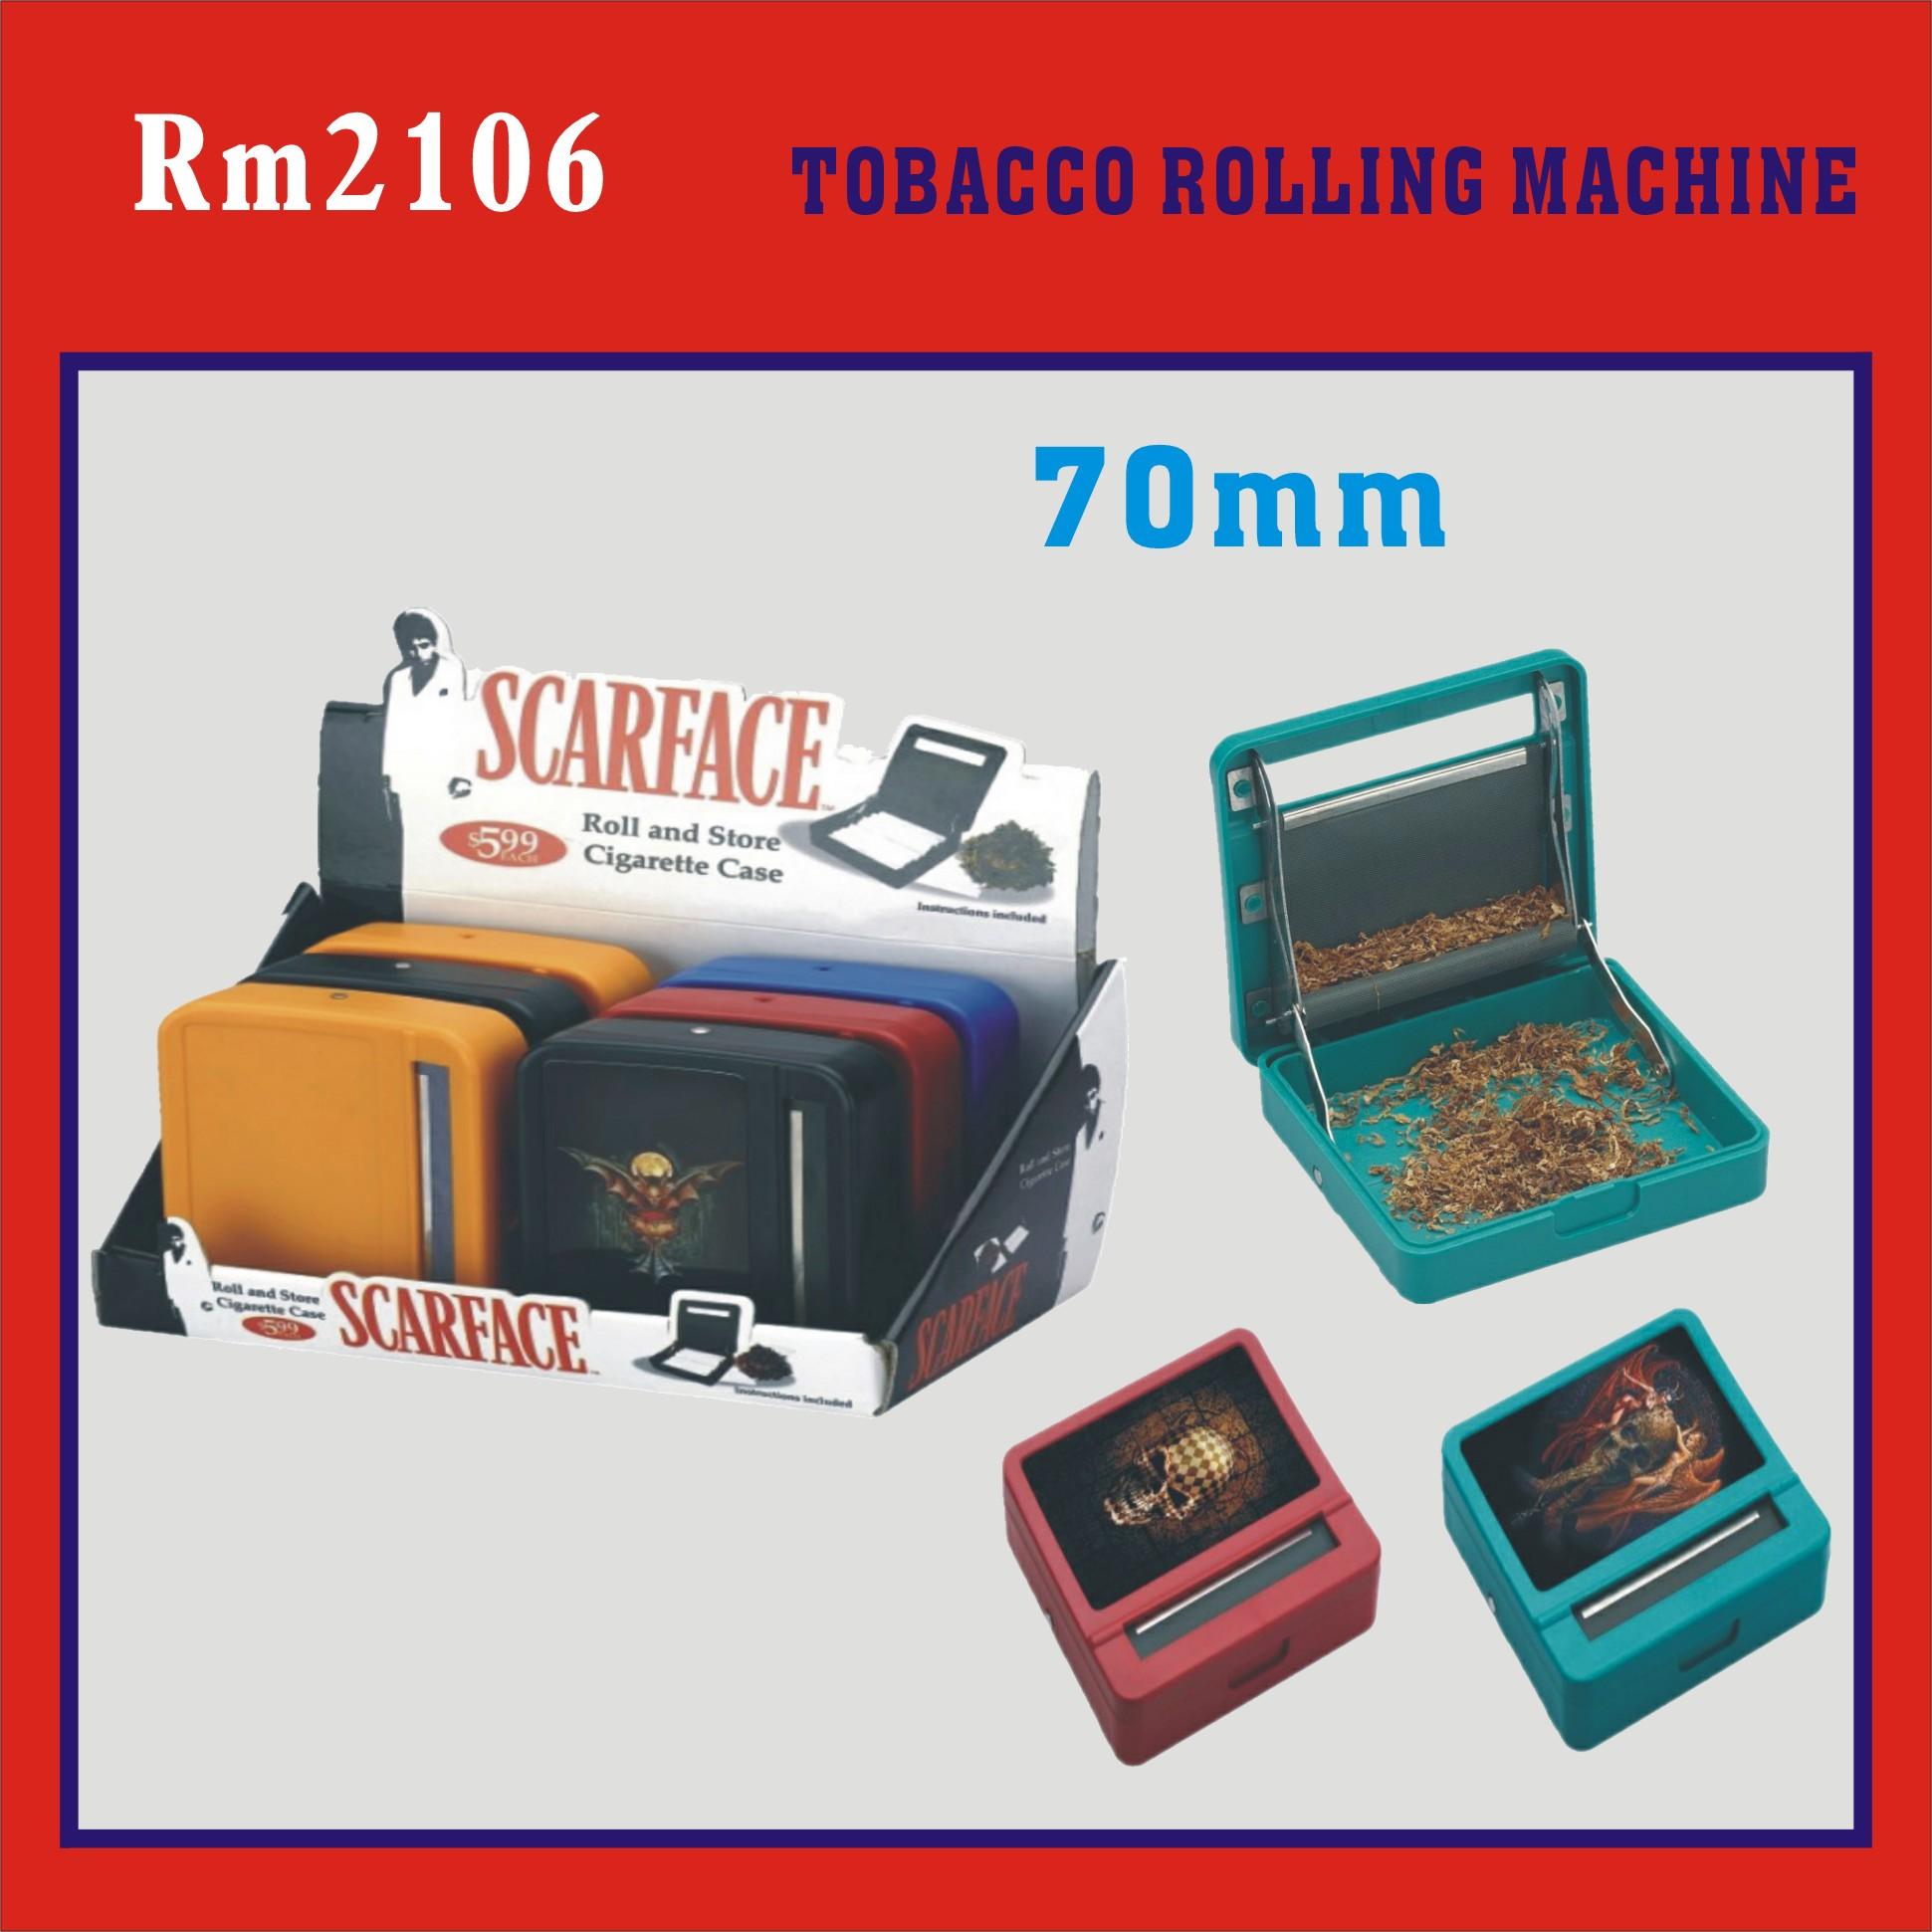 popular case style tobacco rolling machine (Rolling machine with box,tobacco rolling machine)